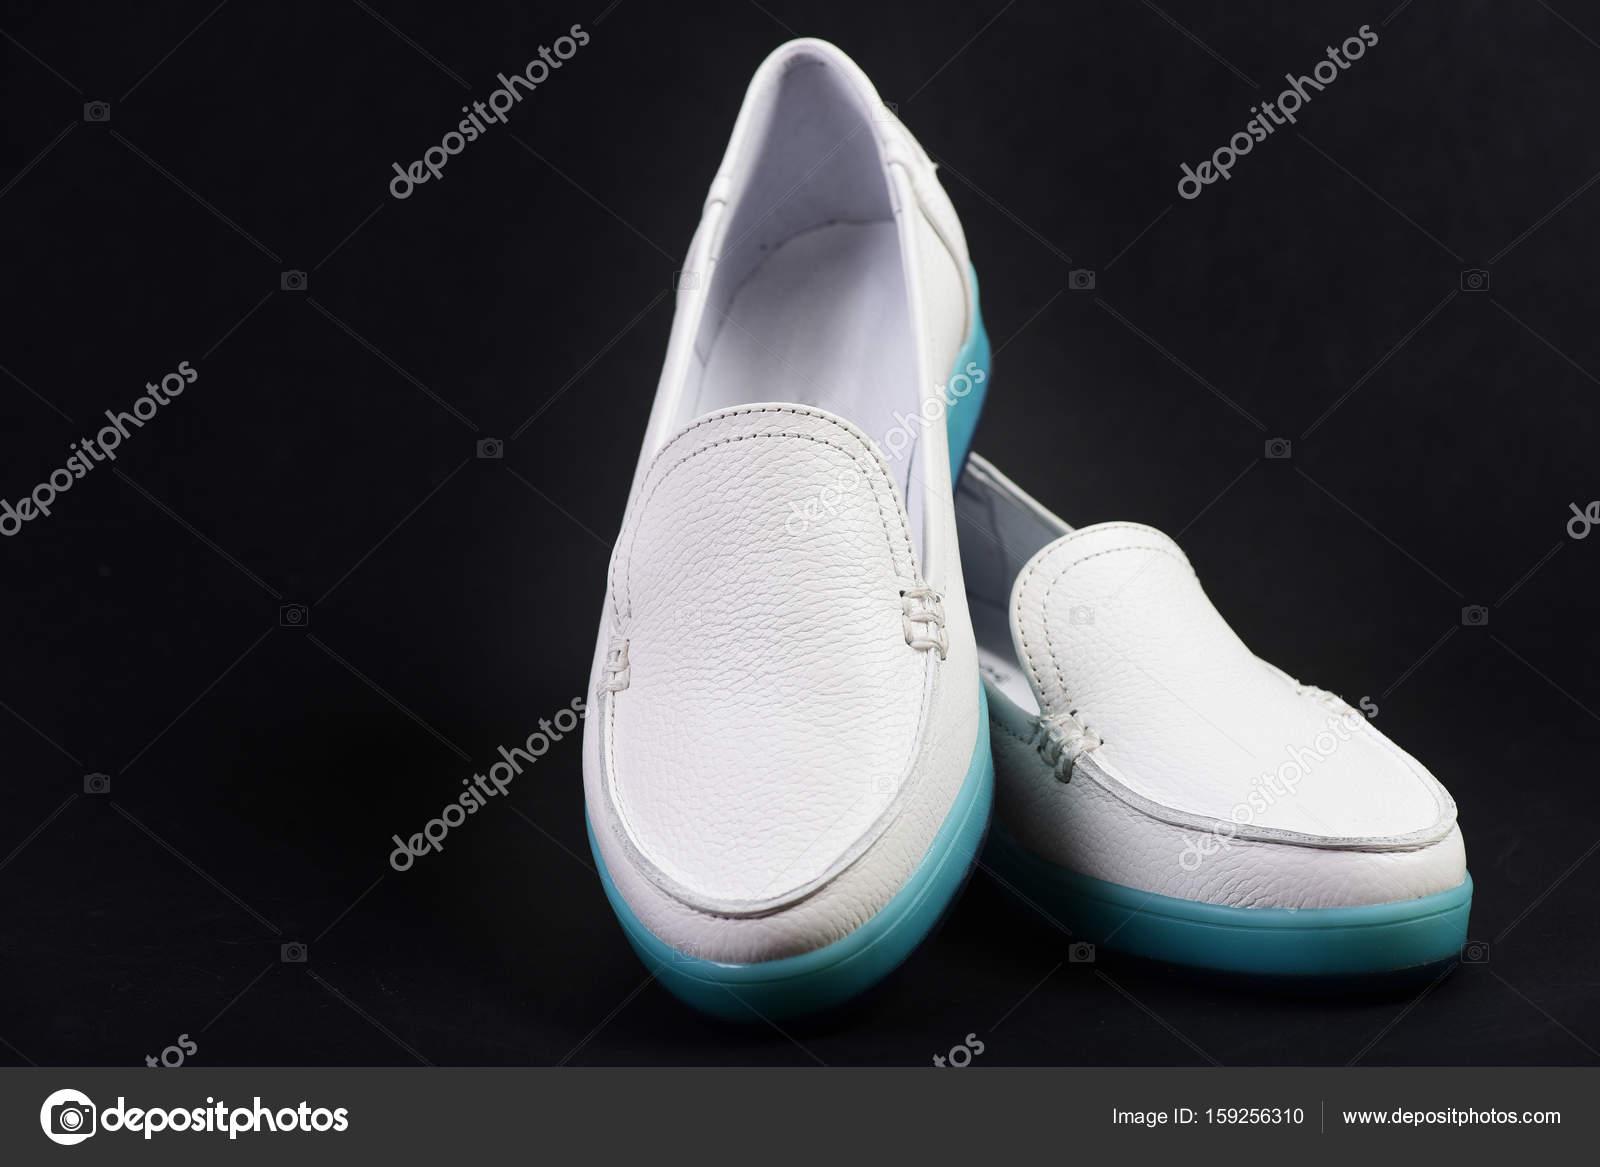 56907e99371 Γυναικείο δερμάτινο ζευγάρι παπούτσια σκούρο μπλε ή μαύρο φόντο ...